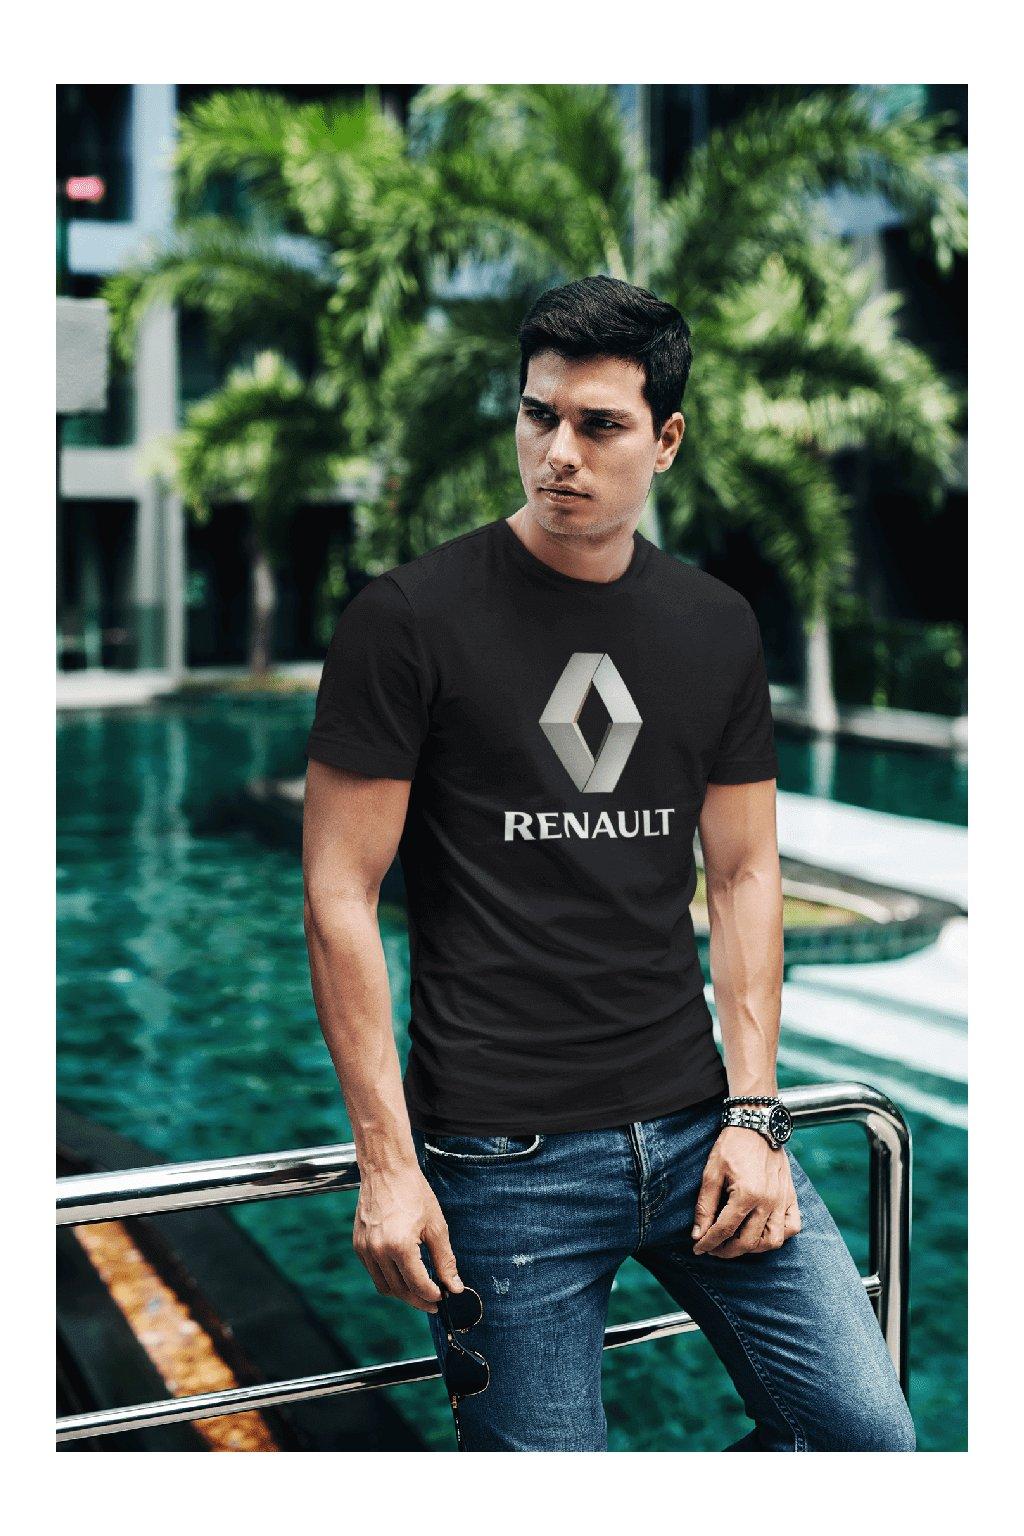 t shirt mockup of a fashionable man posing by a pool 430 el (11)